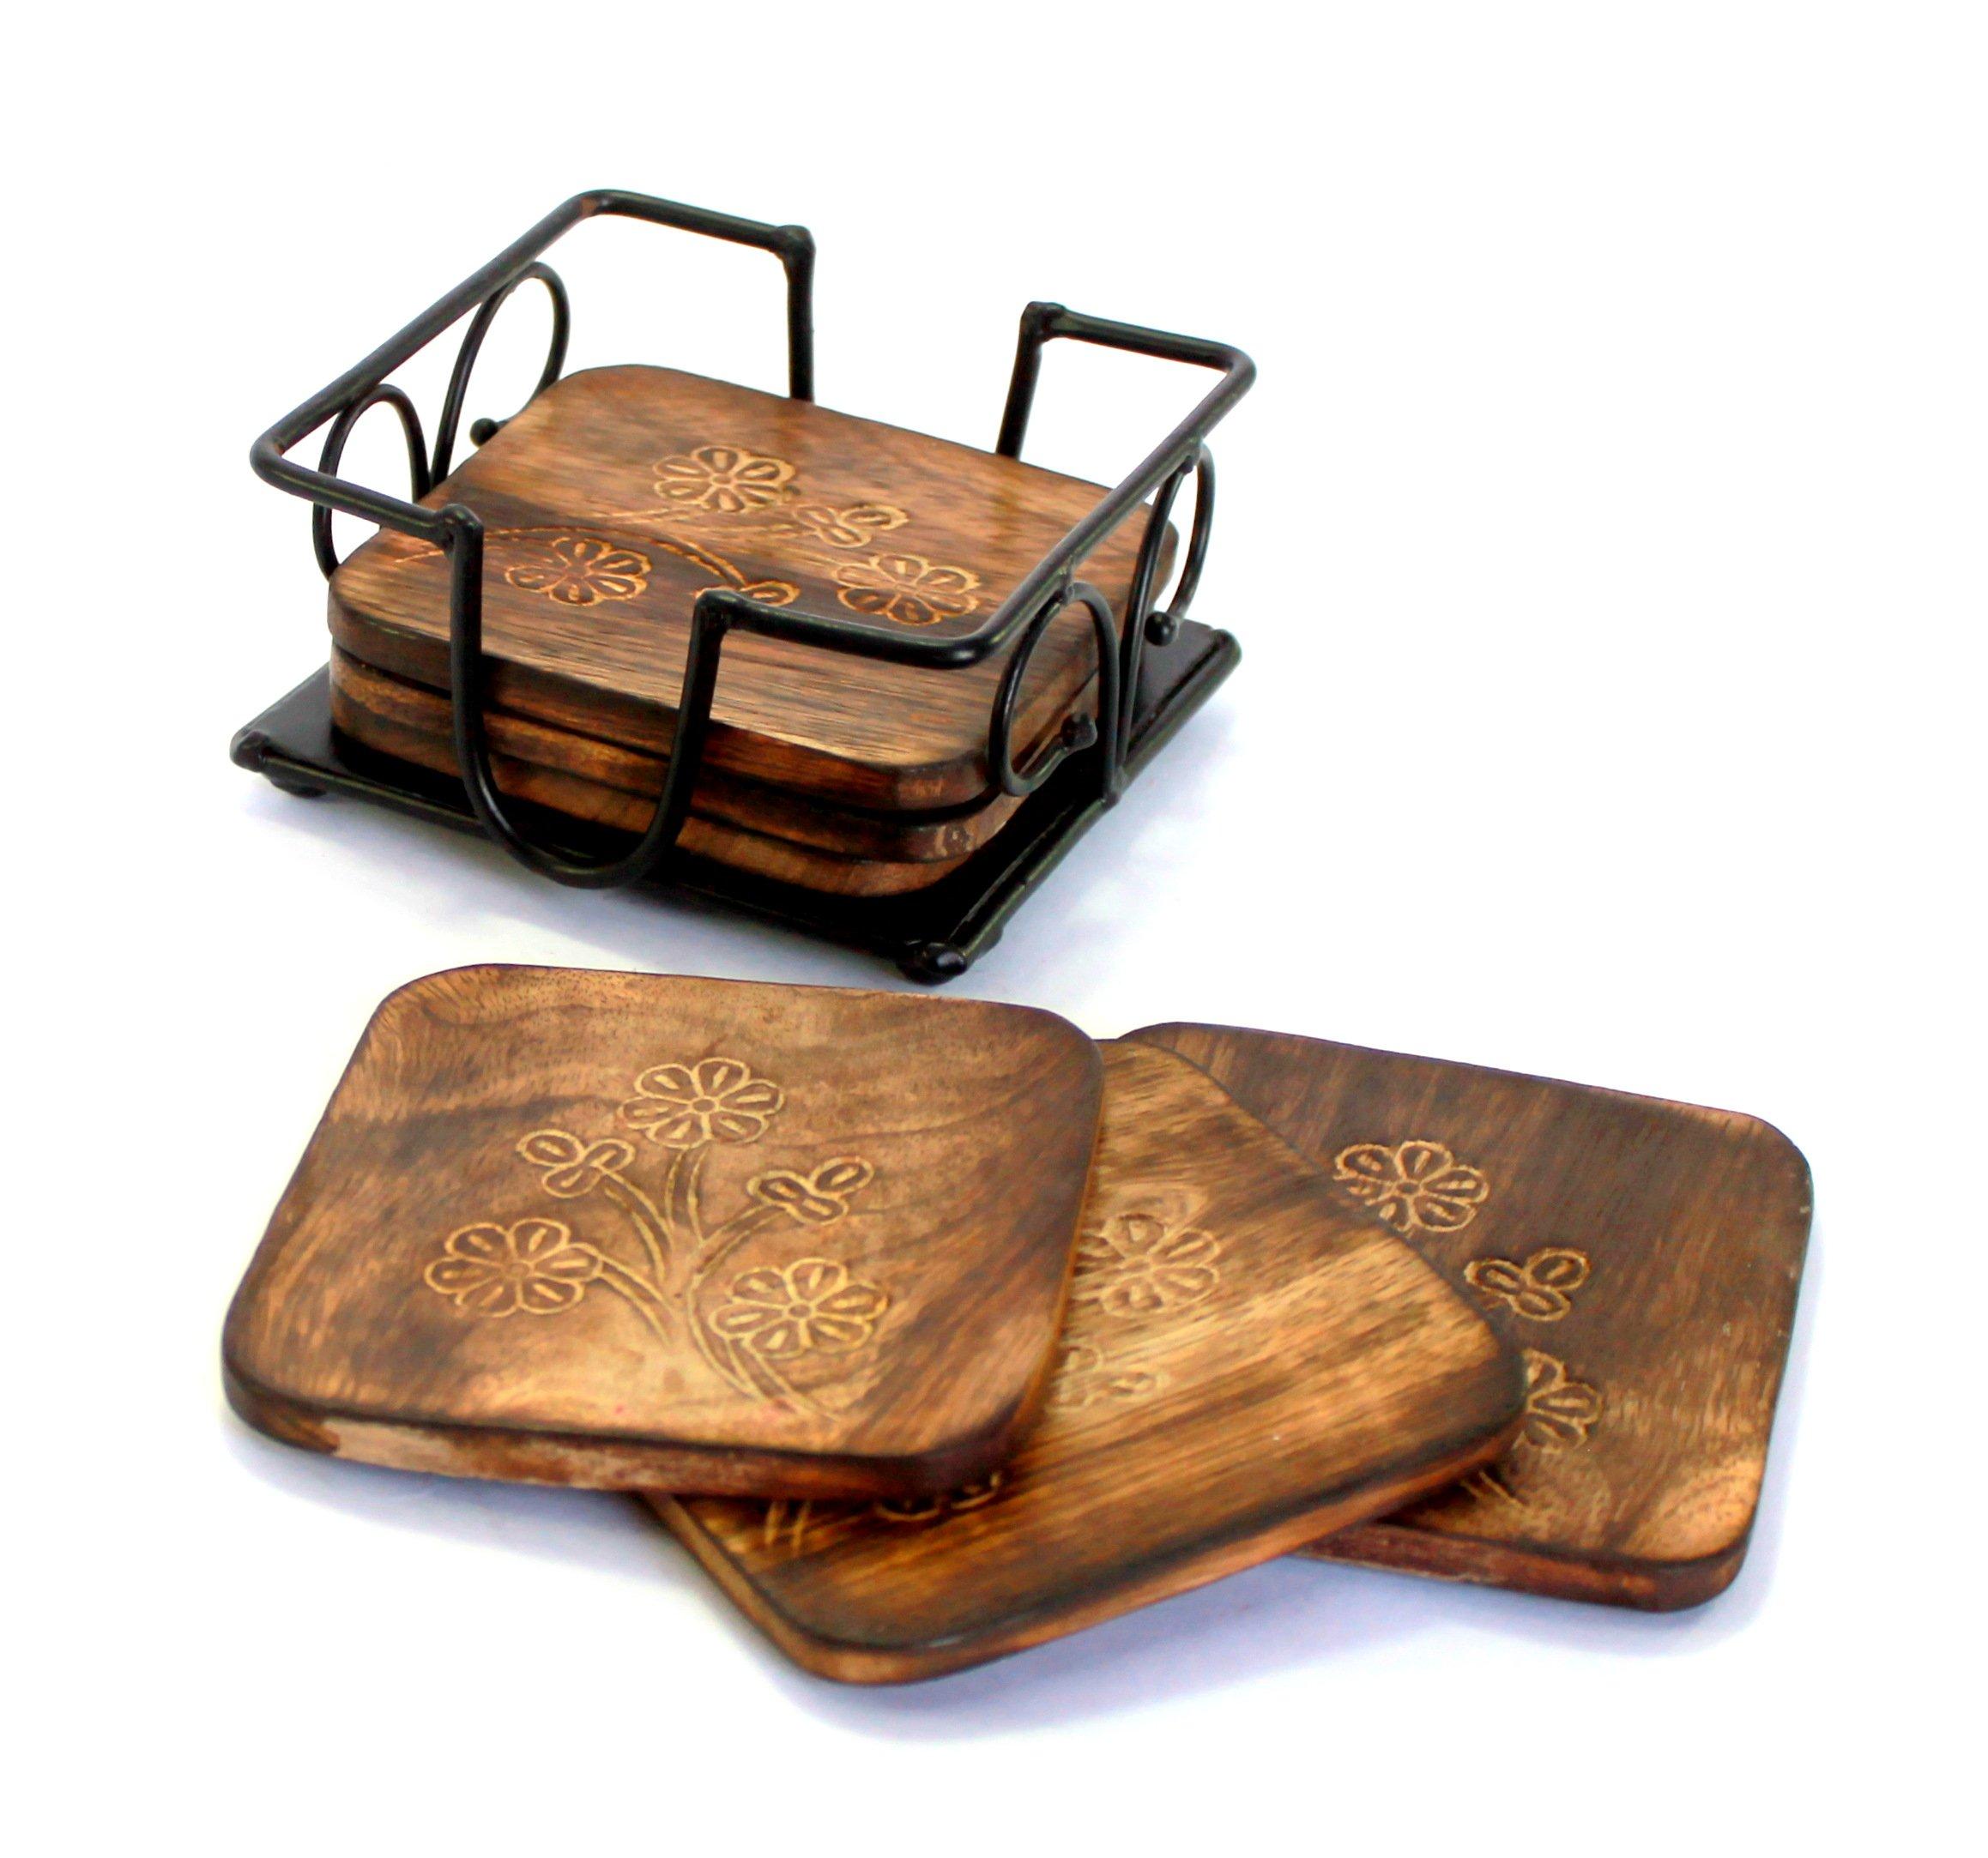 StonKraft Tea Coffee Wooden Coasters Coaster Set Wood Coasters Set (With Iron Holder)